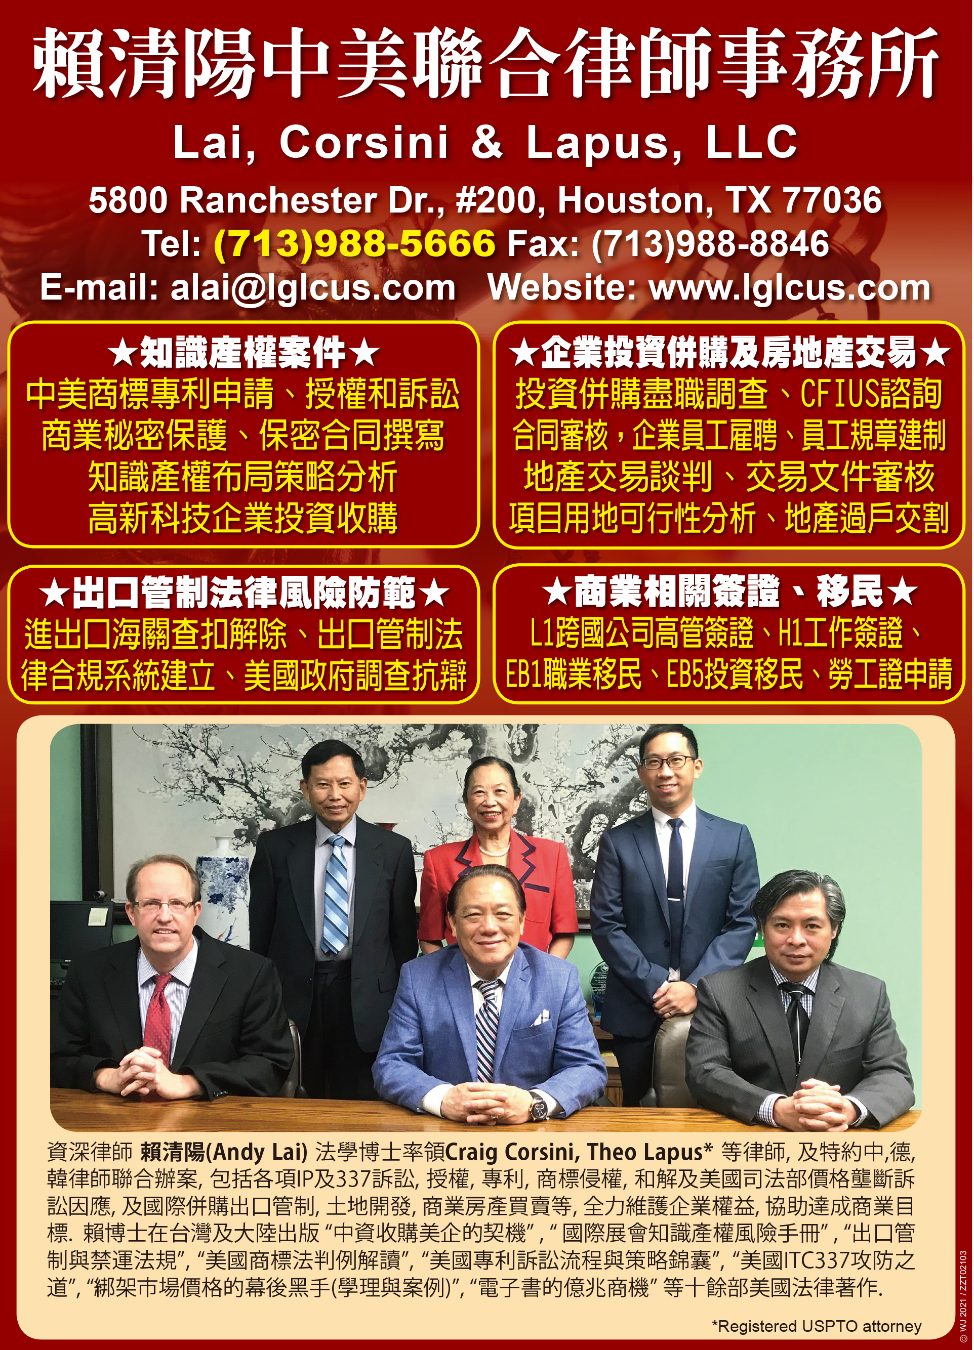 Lai, Corsini & Lapus 賴清陽中美聯合律師事務所